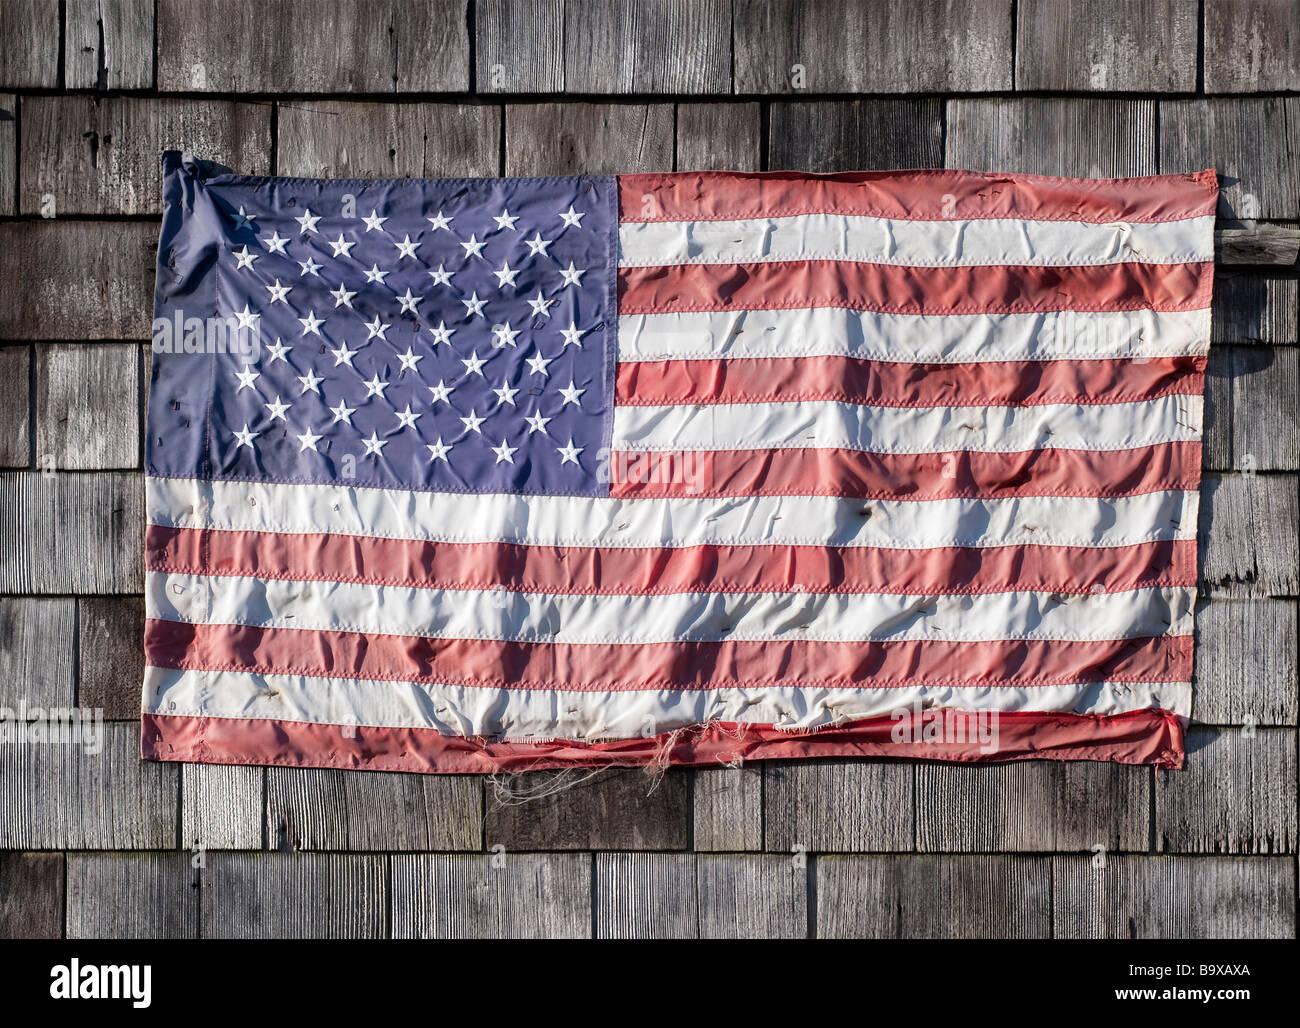 Amerikanische Flagge getragen Stockbild